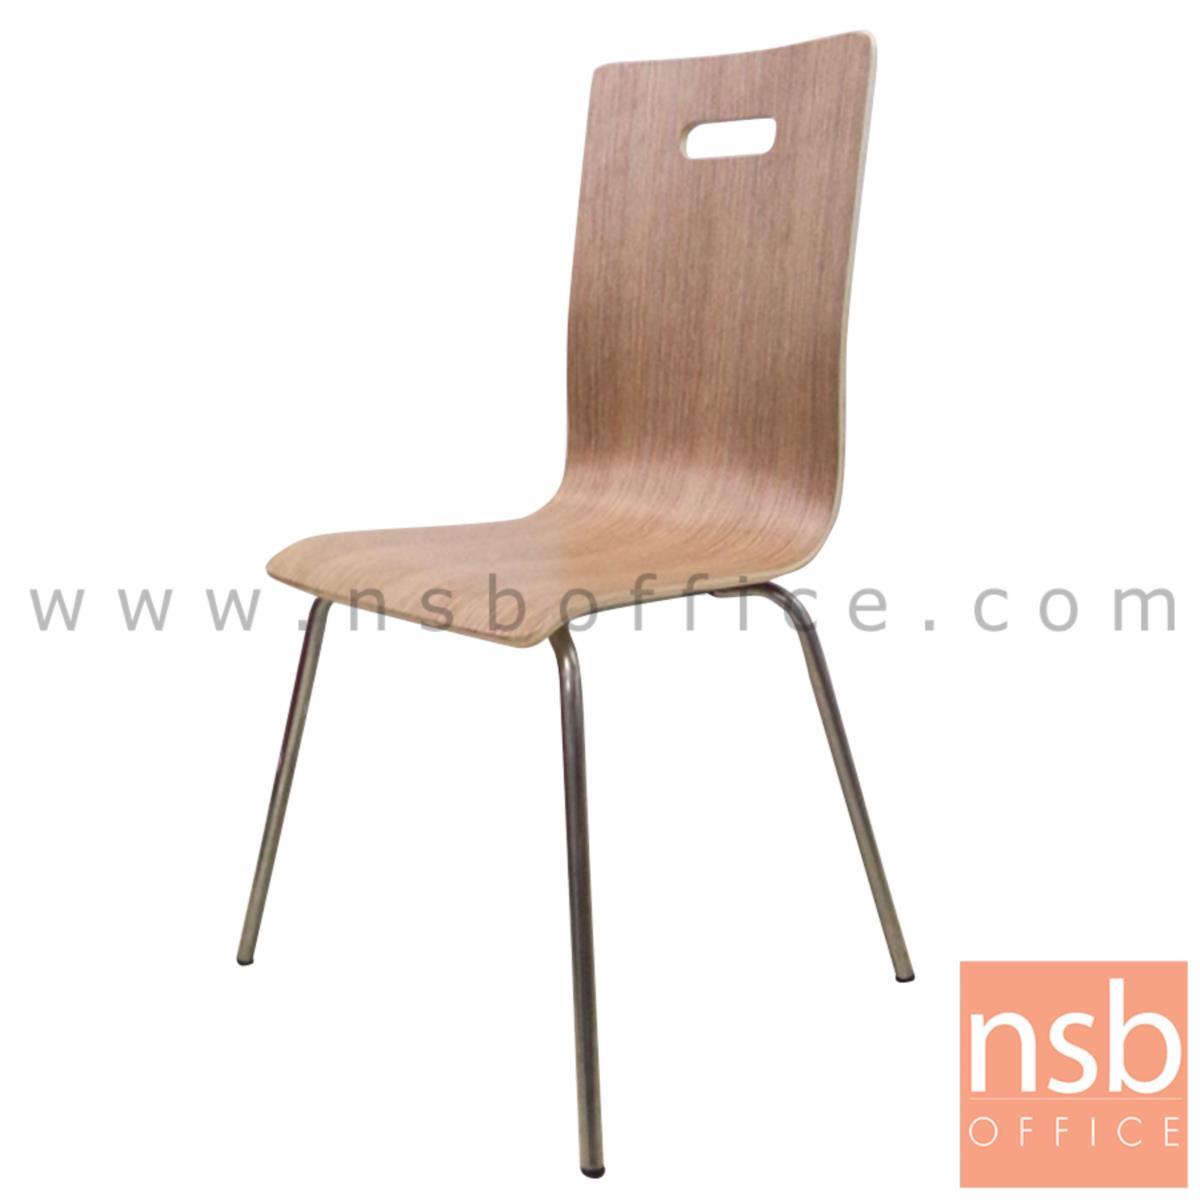 B20A076:เก้าอี้อเนกประสงค์ไม้ดัด รุ่น Dale (เดล)  ขาสแตนเลส